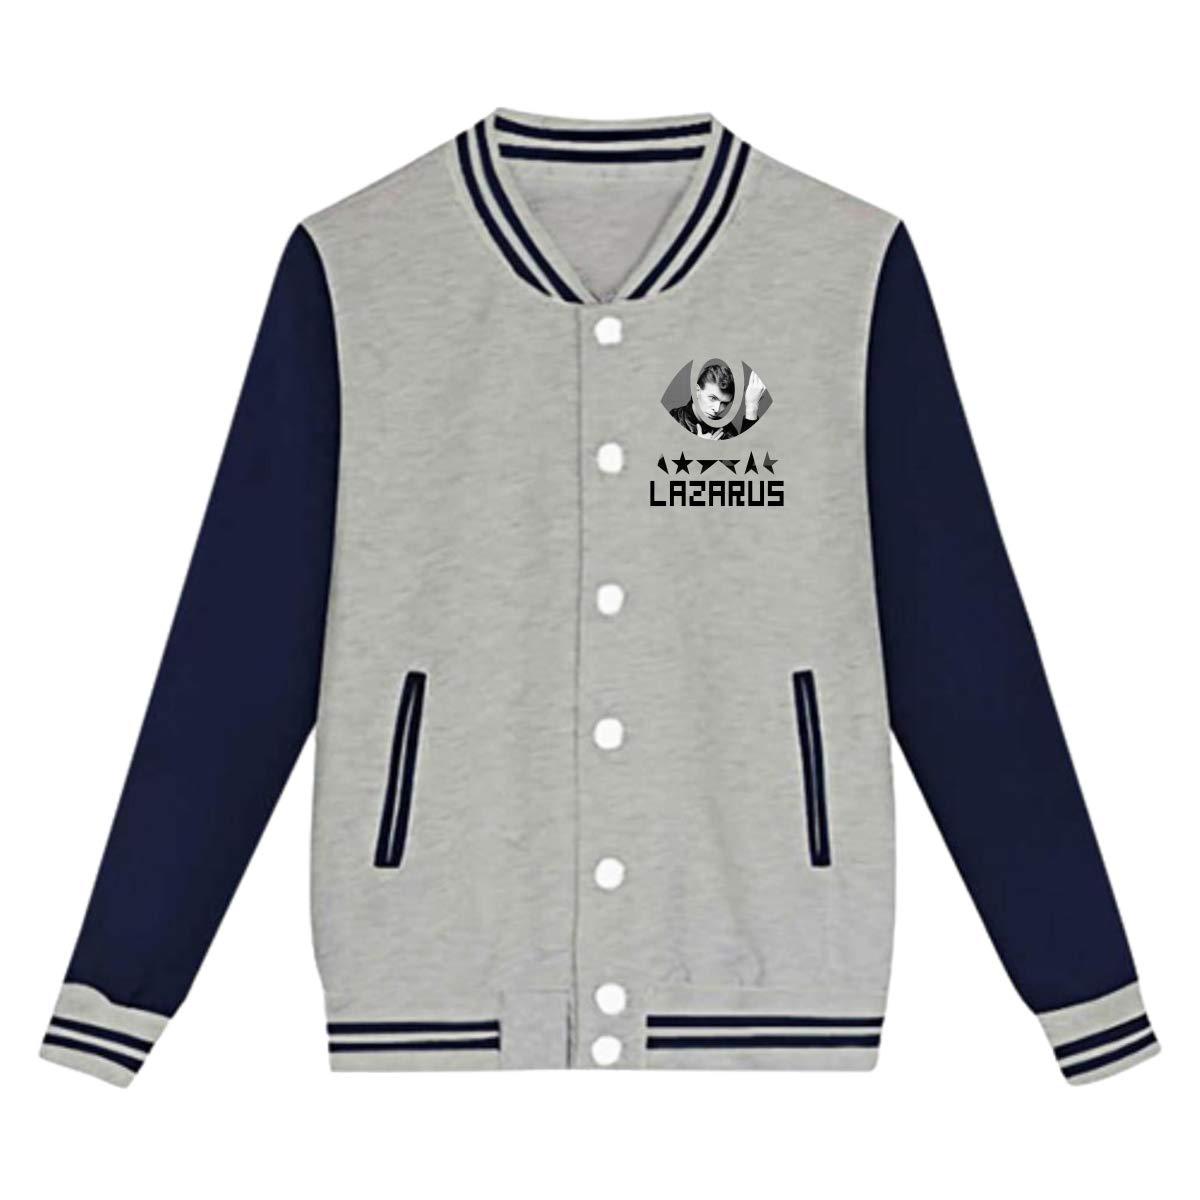 LIALUER Lazarus Last Release Parting Gift David Bowie Souvenir Teenager Baseball Jacket Uniform V Sweater Coat